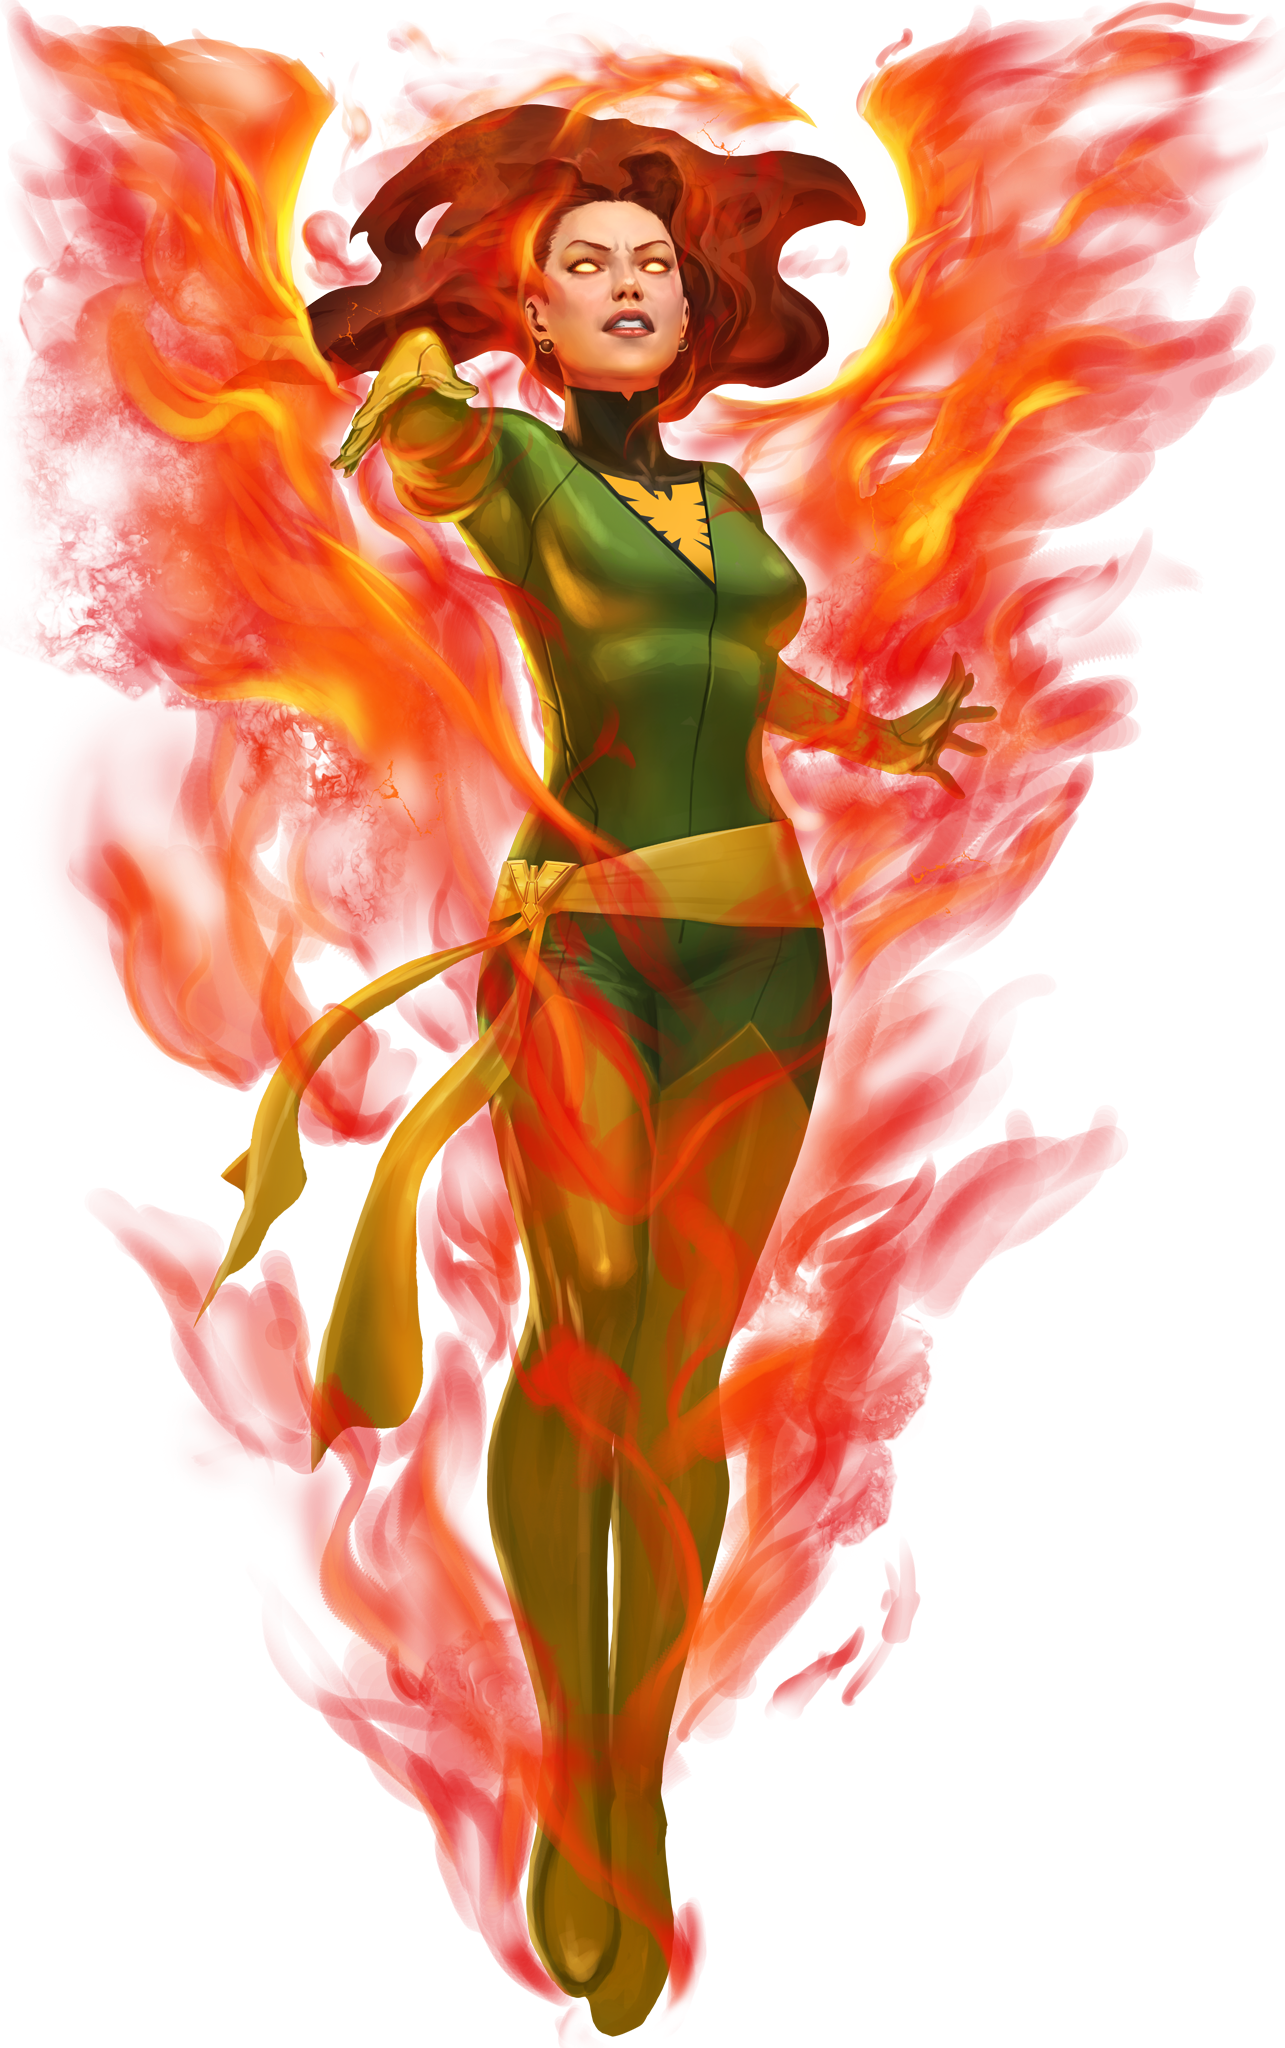 Jean Grey Marvel Comics Vs Battles Wiki Fandom Powered By Wikia Jean Grey Phoenix Marvel Jean Grey Jean Grey